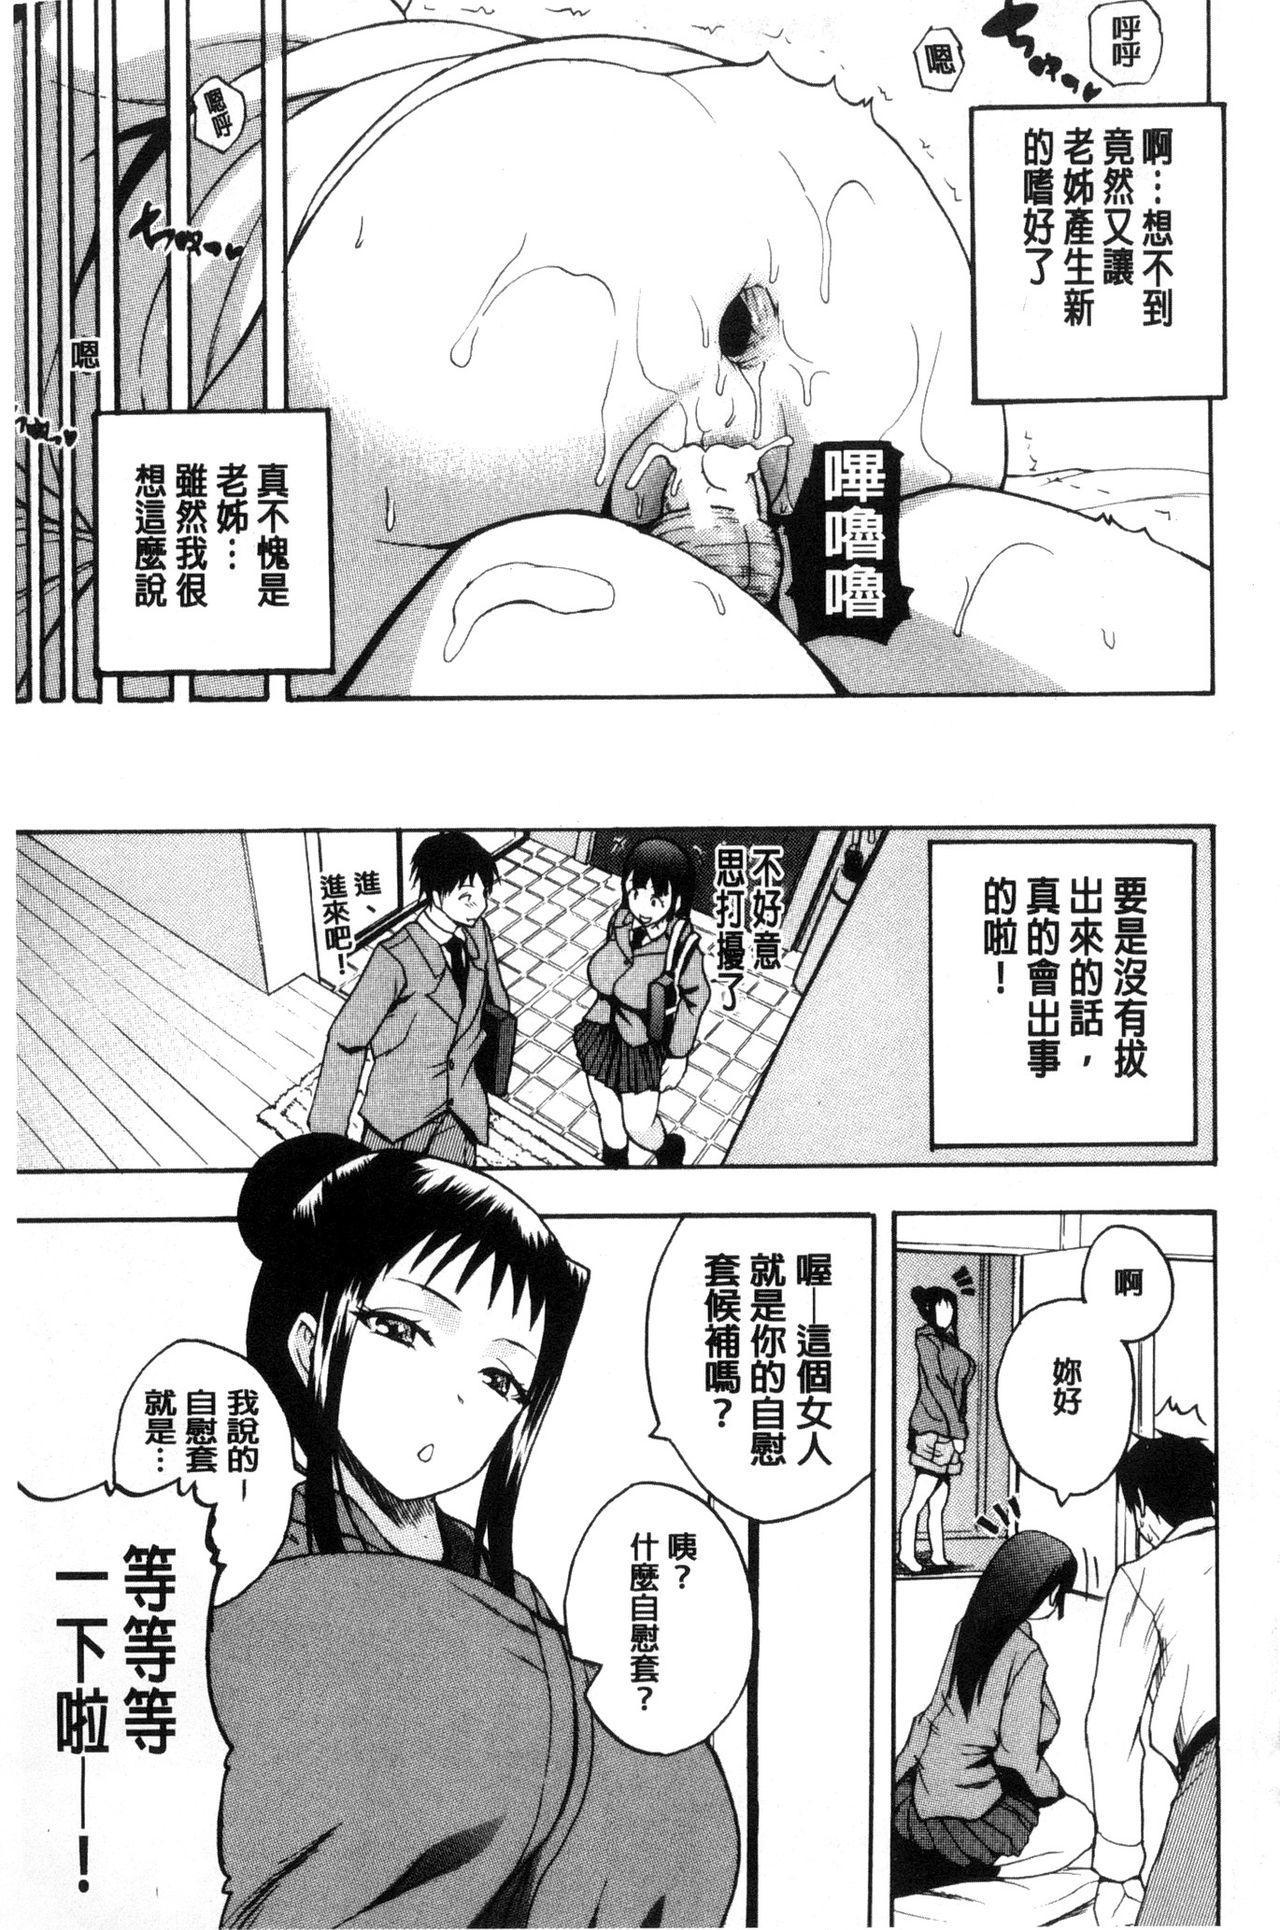 Opink Health Seibo no Fukuin 187